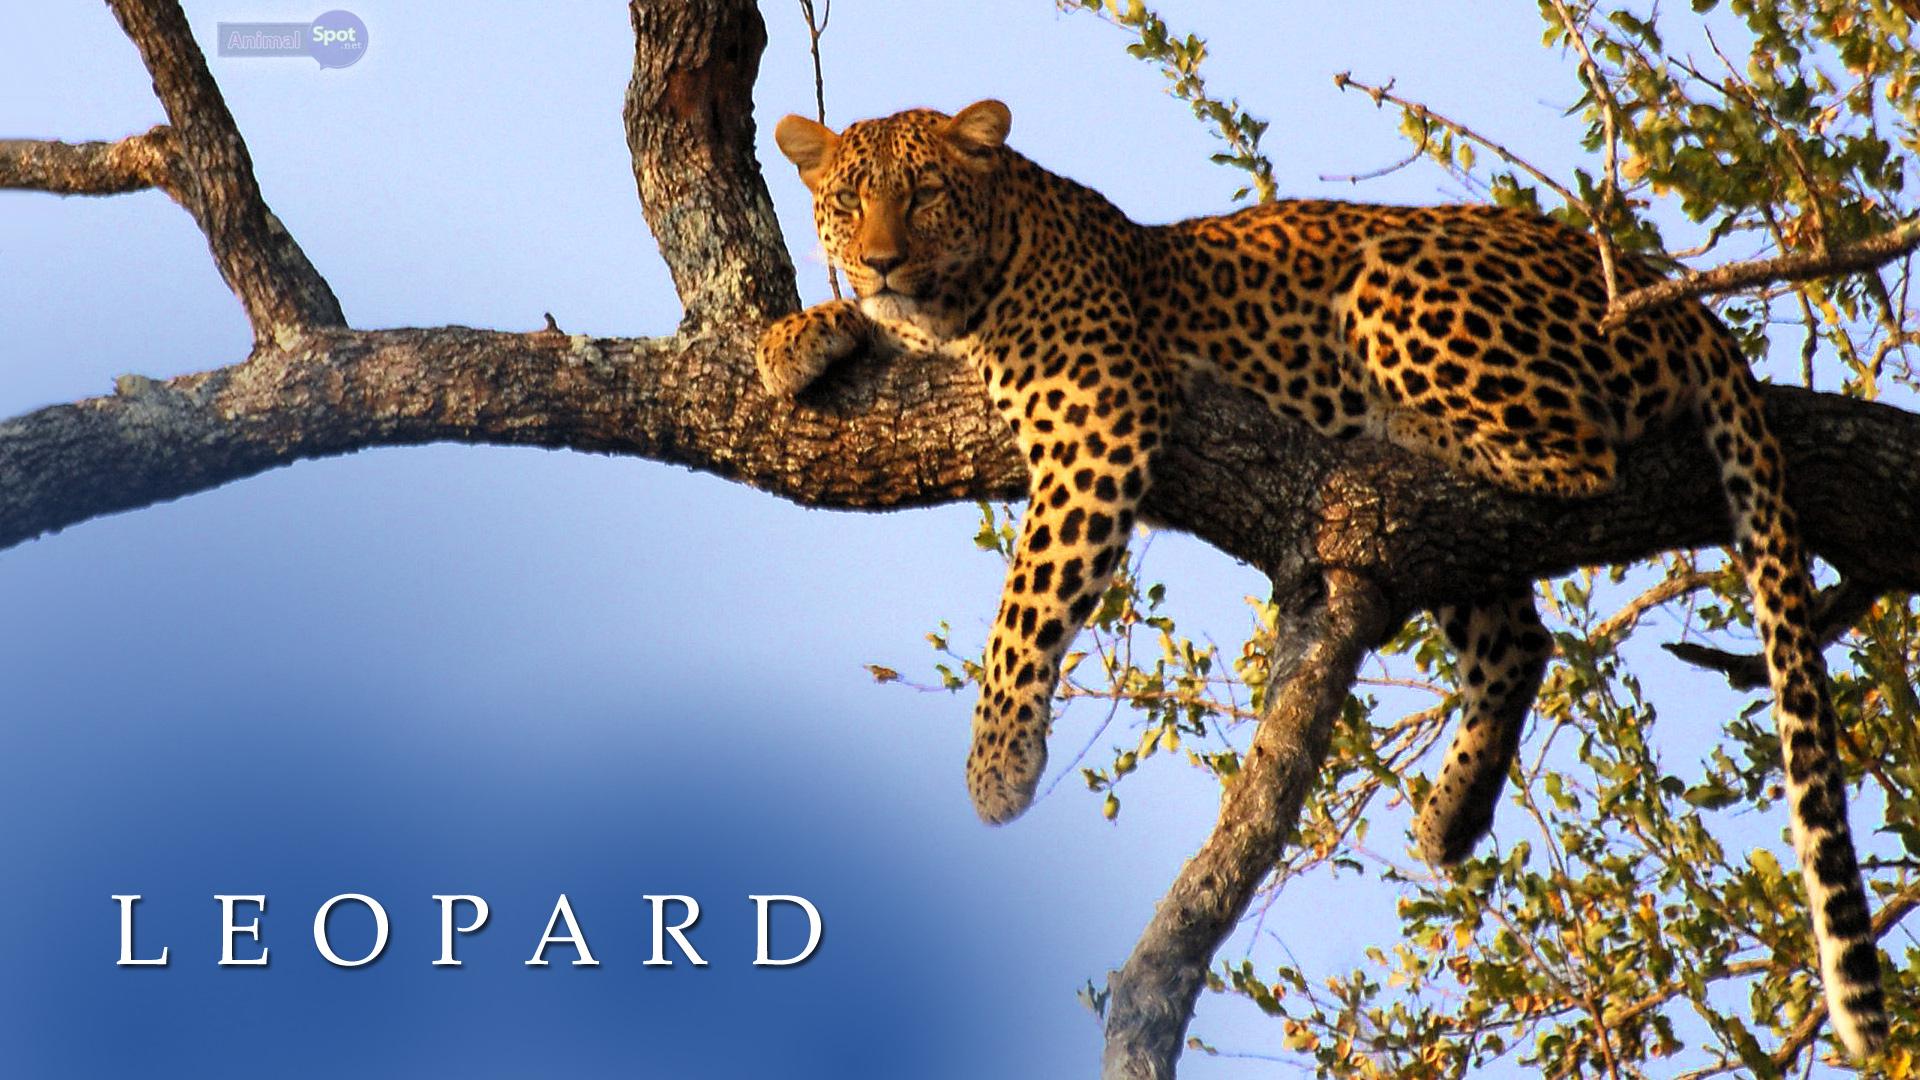 Leopard Wallpapers Animal Spot 1920x1080